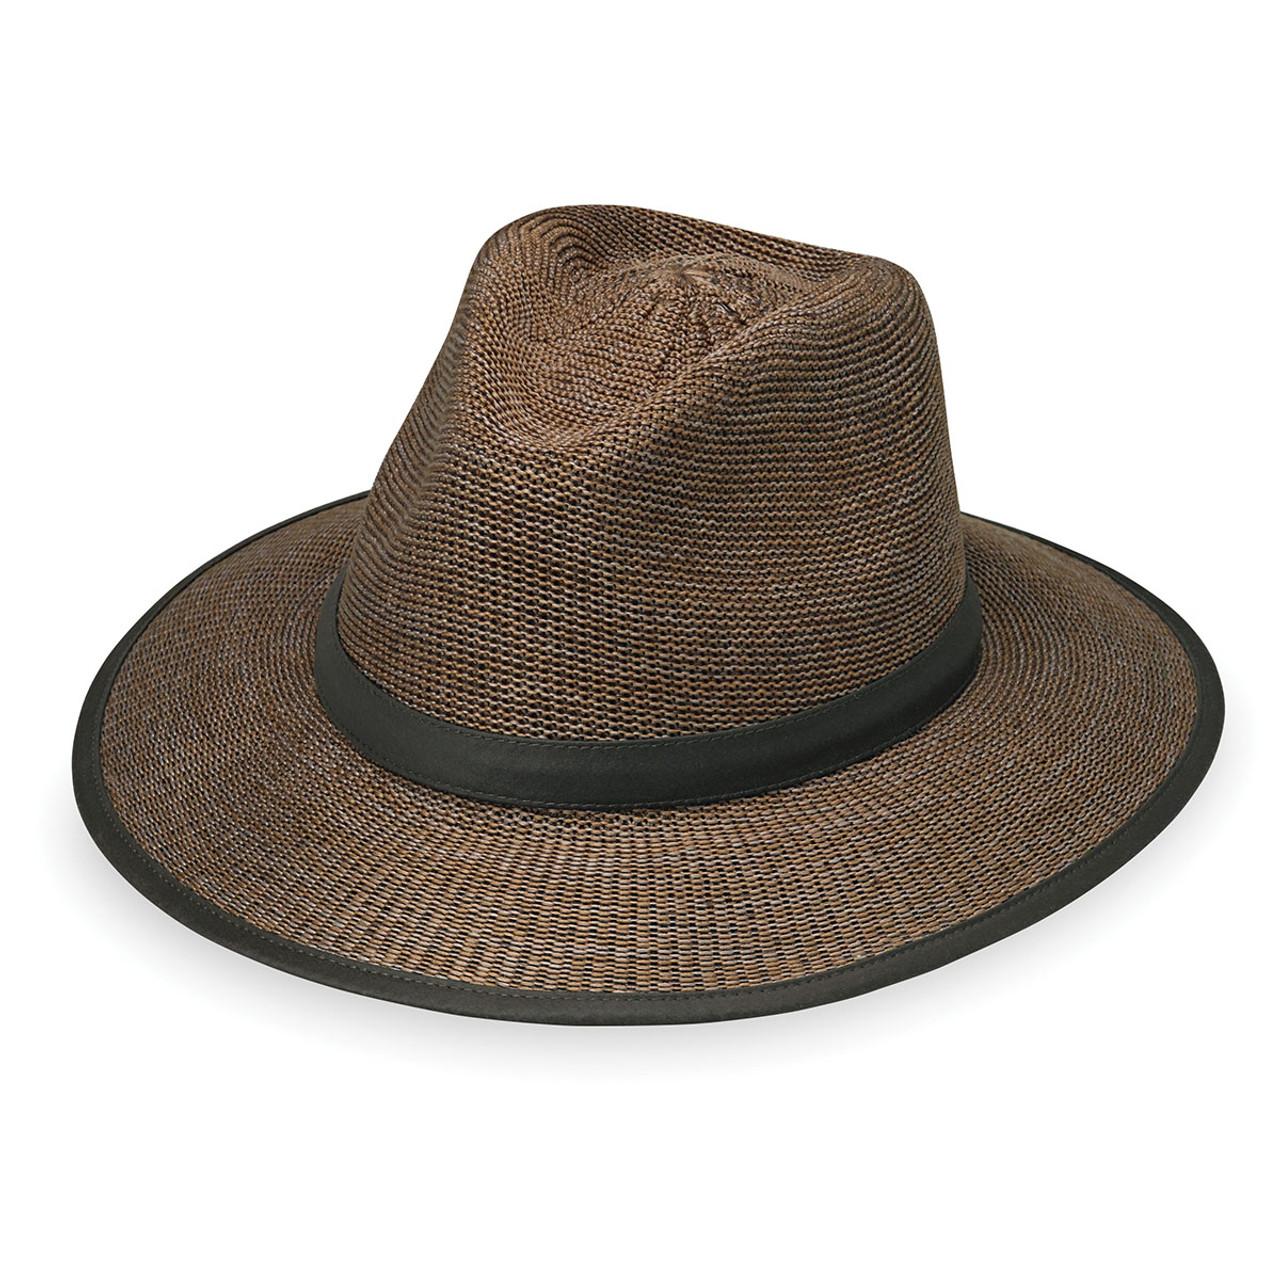 ... bc083 c00eb Mens Wallaroo gabe UV Sun hat  wholesale 6b692 a48c1 Hair  mens straw hat Panama Christies London United Kingdom brand Hat spring  summer ... cbcabcf63734